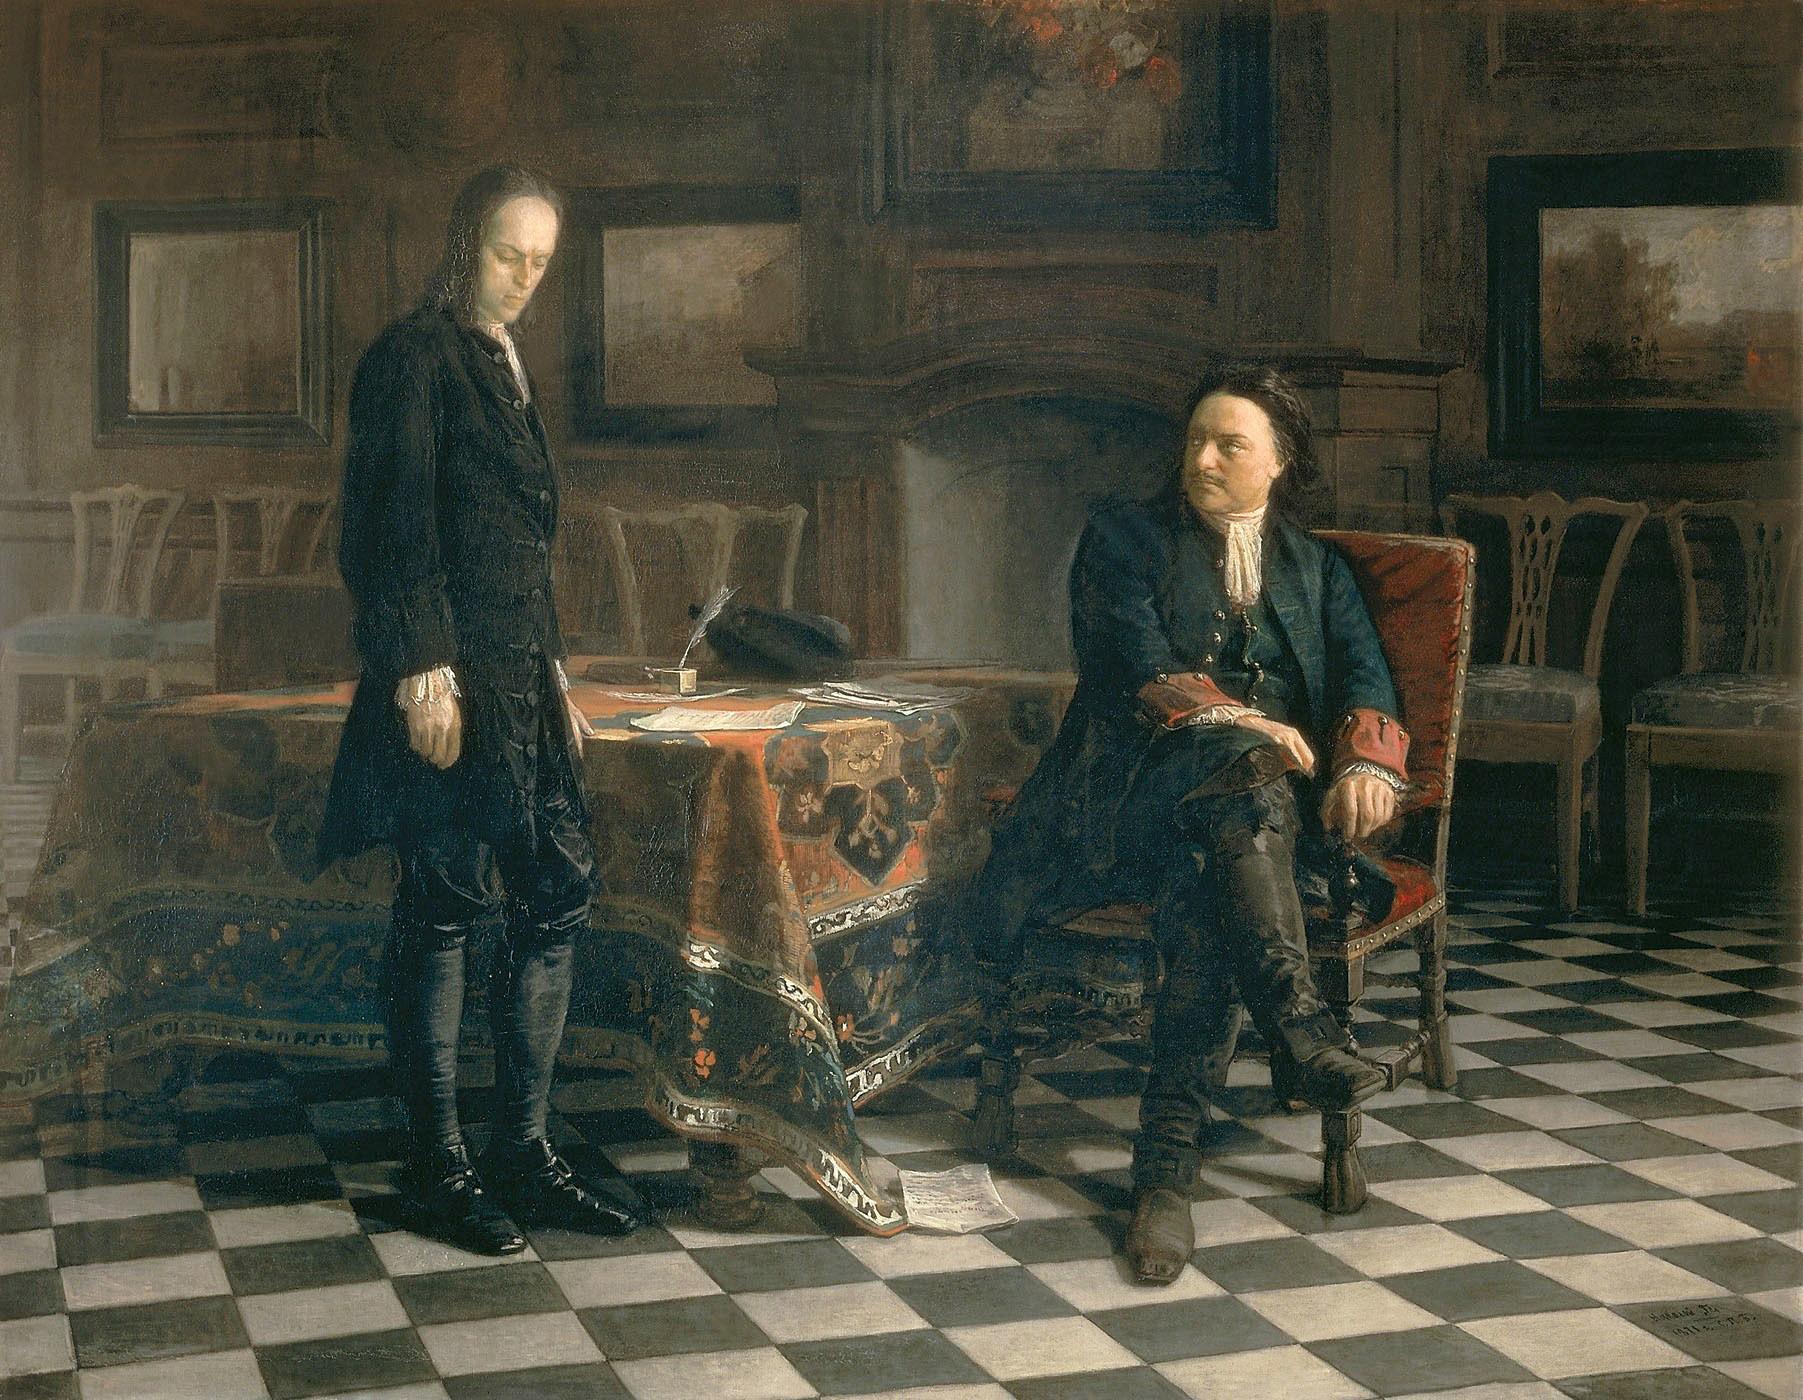 Nikolay Ge. 'Peter the Great interrogates his son Alexey' (1871).